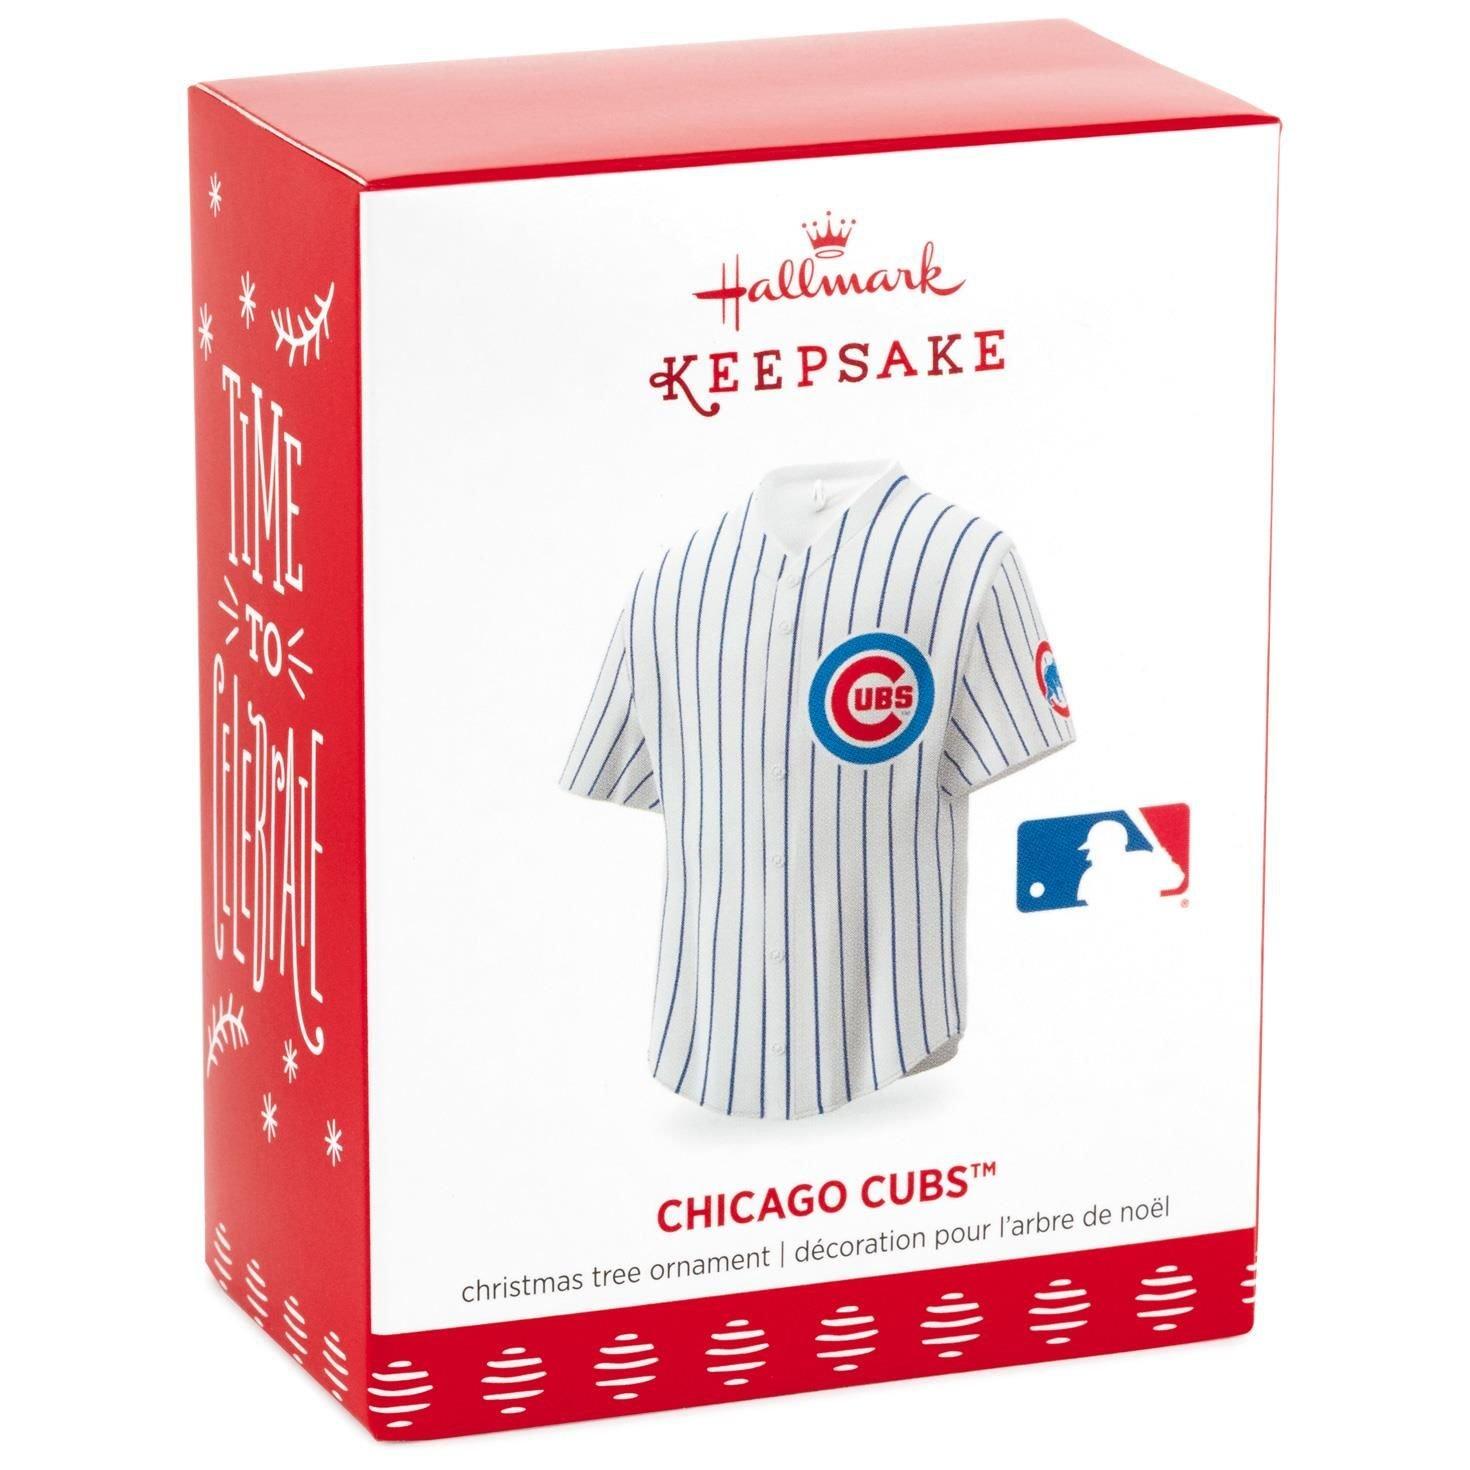 Hallmark MLB Chicago Cubs Jersey Keepsake Christmas Ornaments